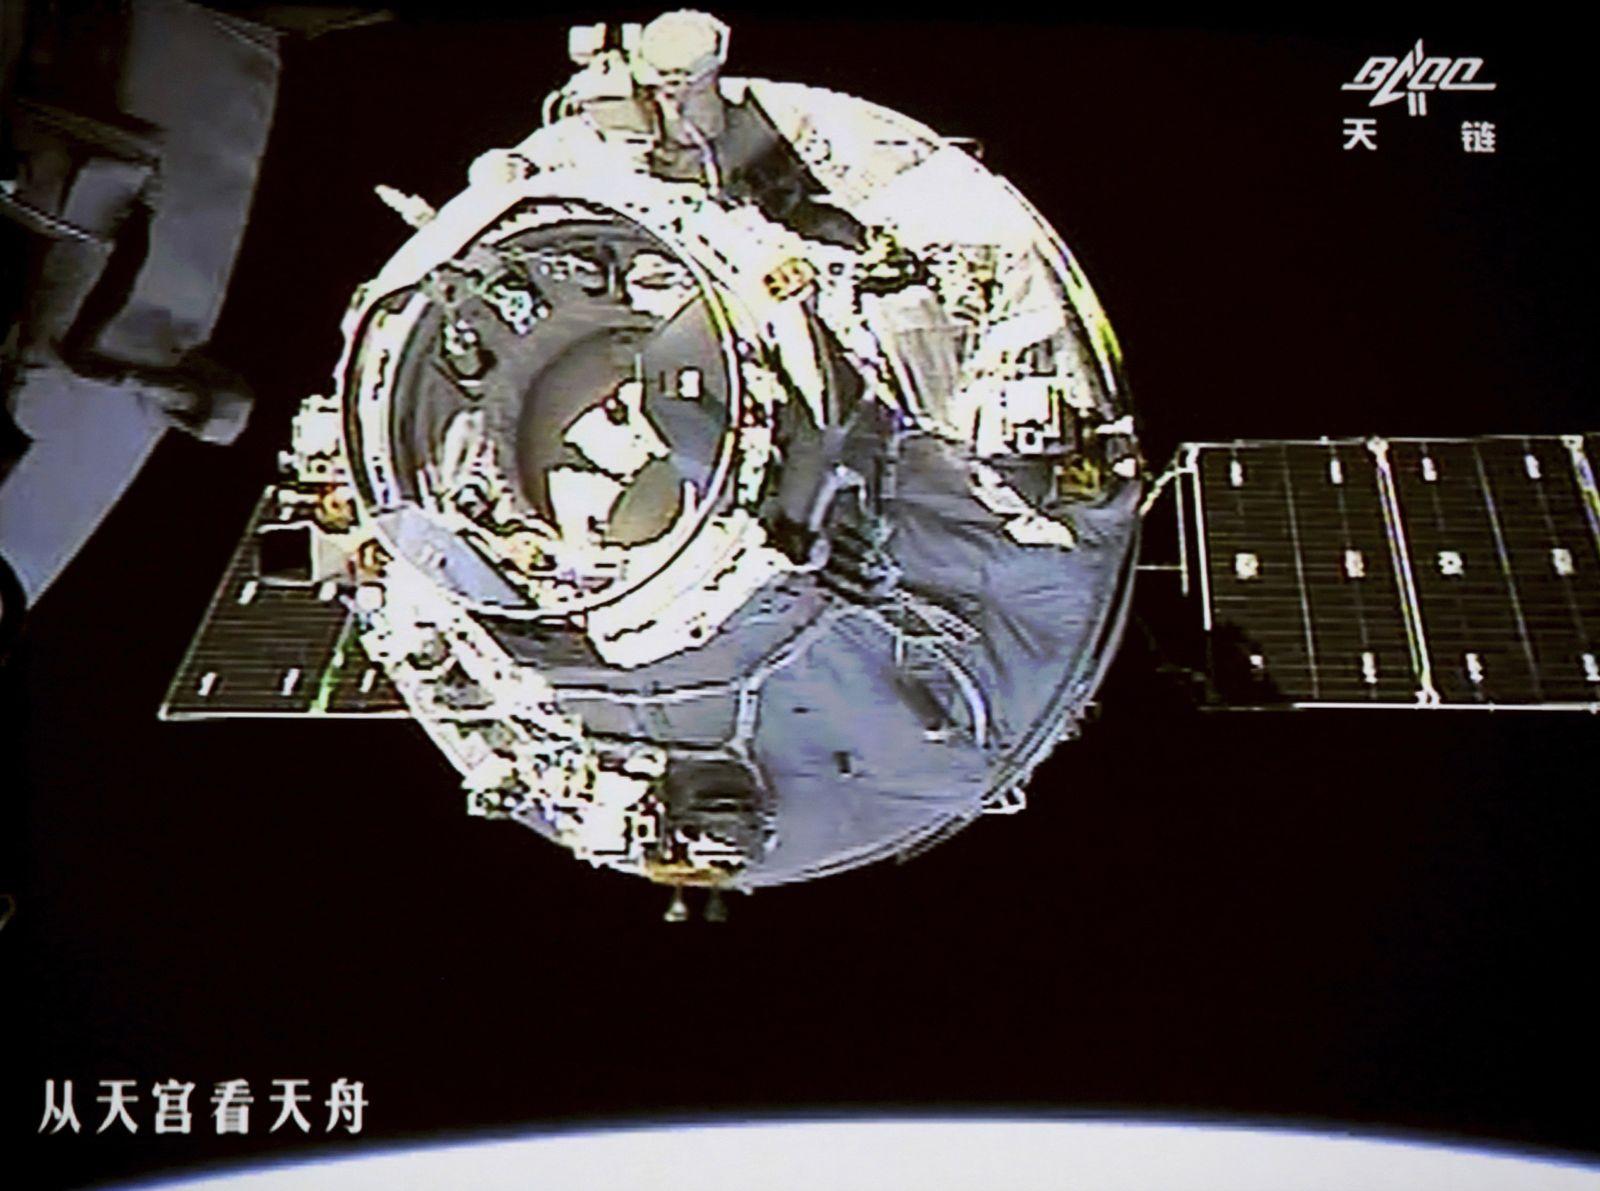 Chinas Raumlabor soll verglühen